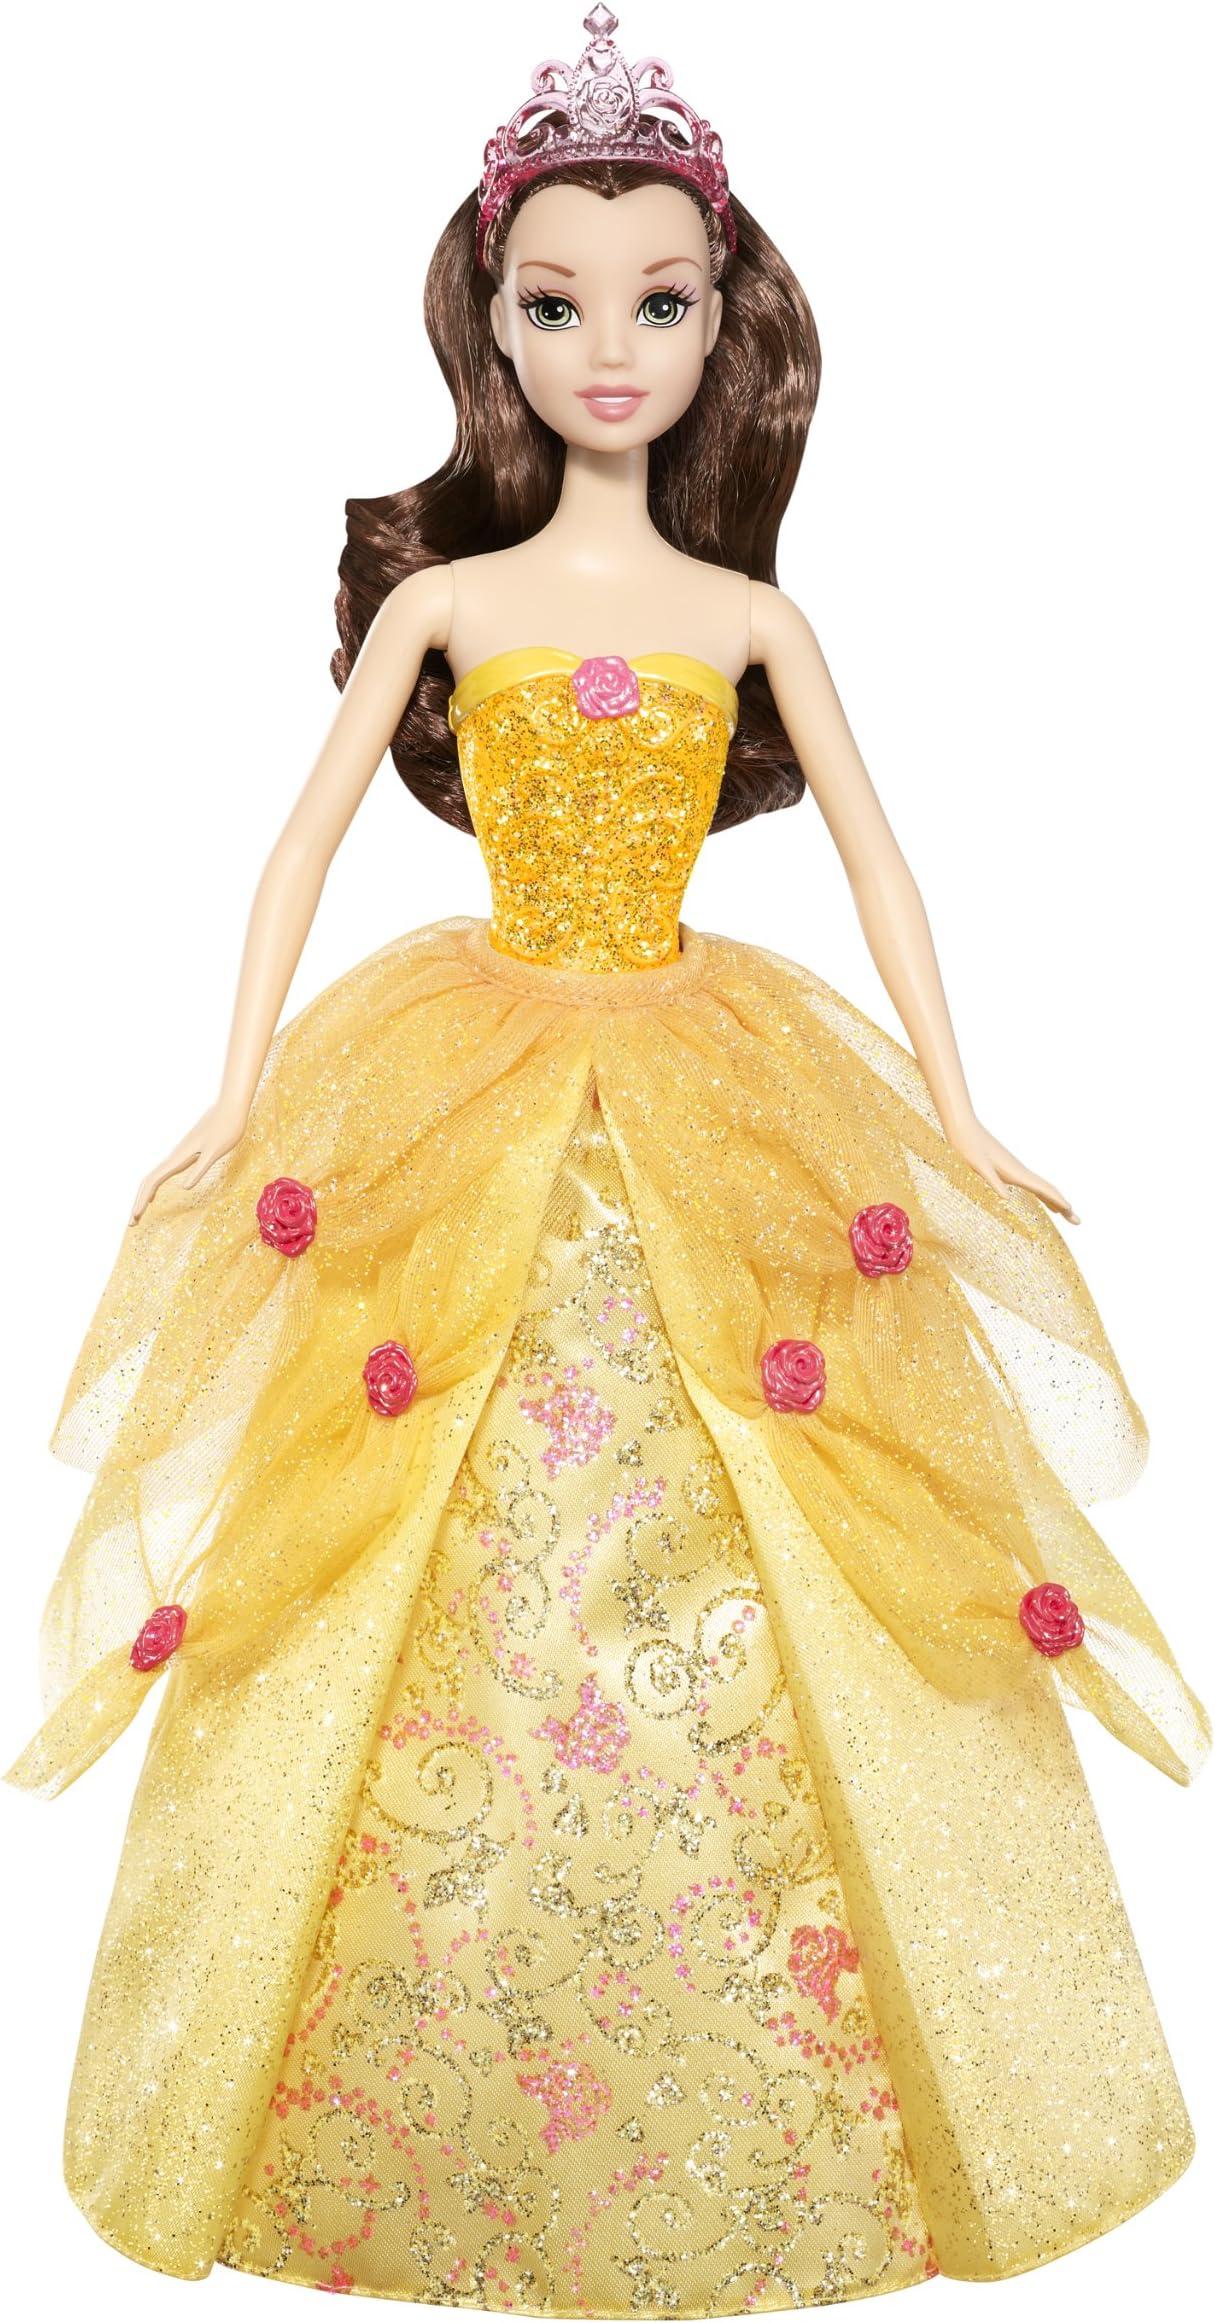 Disney Princess 2-In-1 Ballgown Surprise Belle Doll